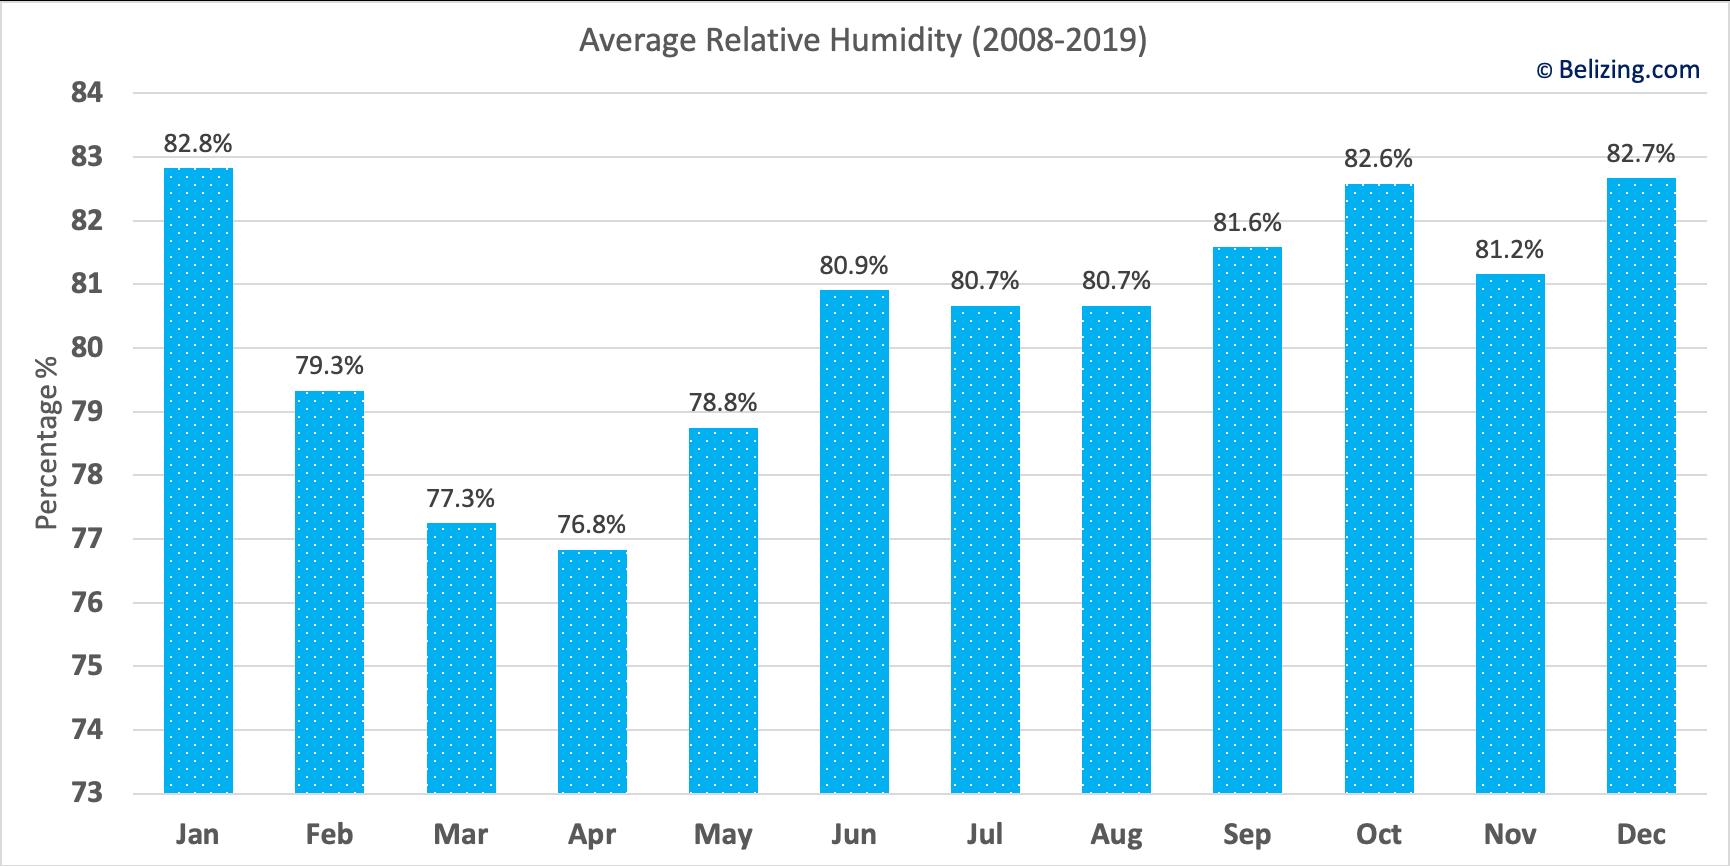 Belize Average Relative Humidity